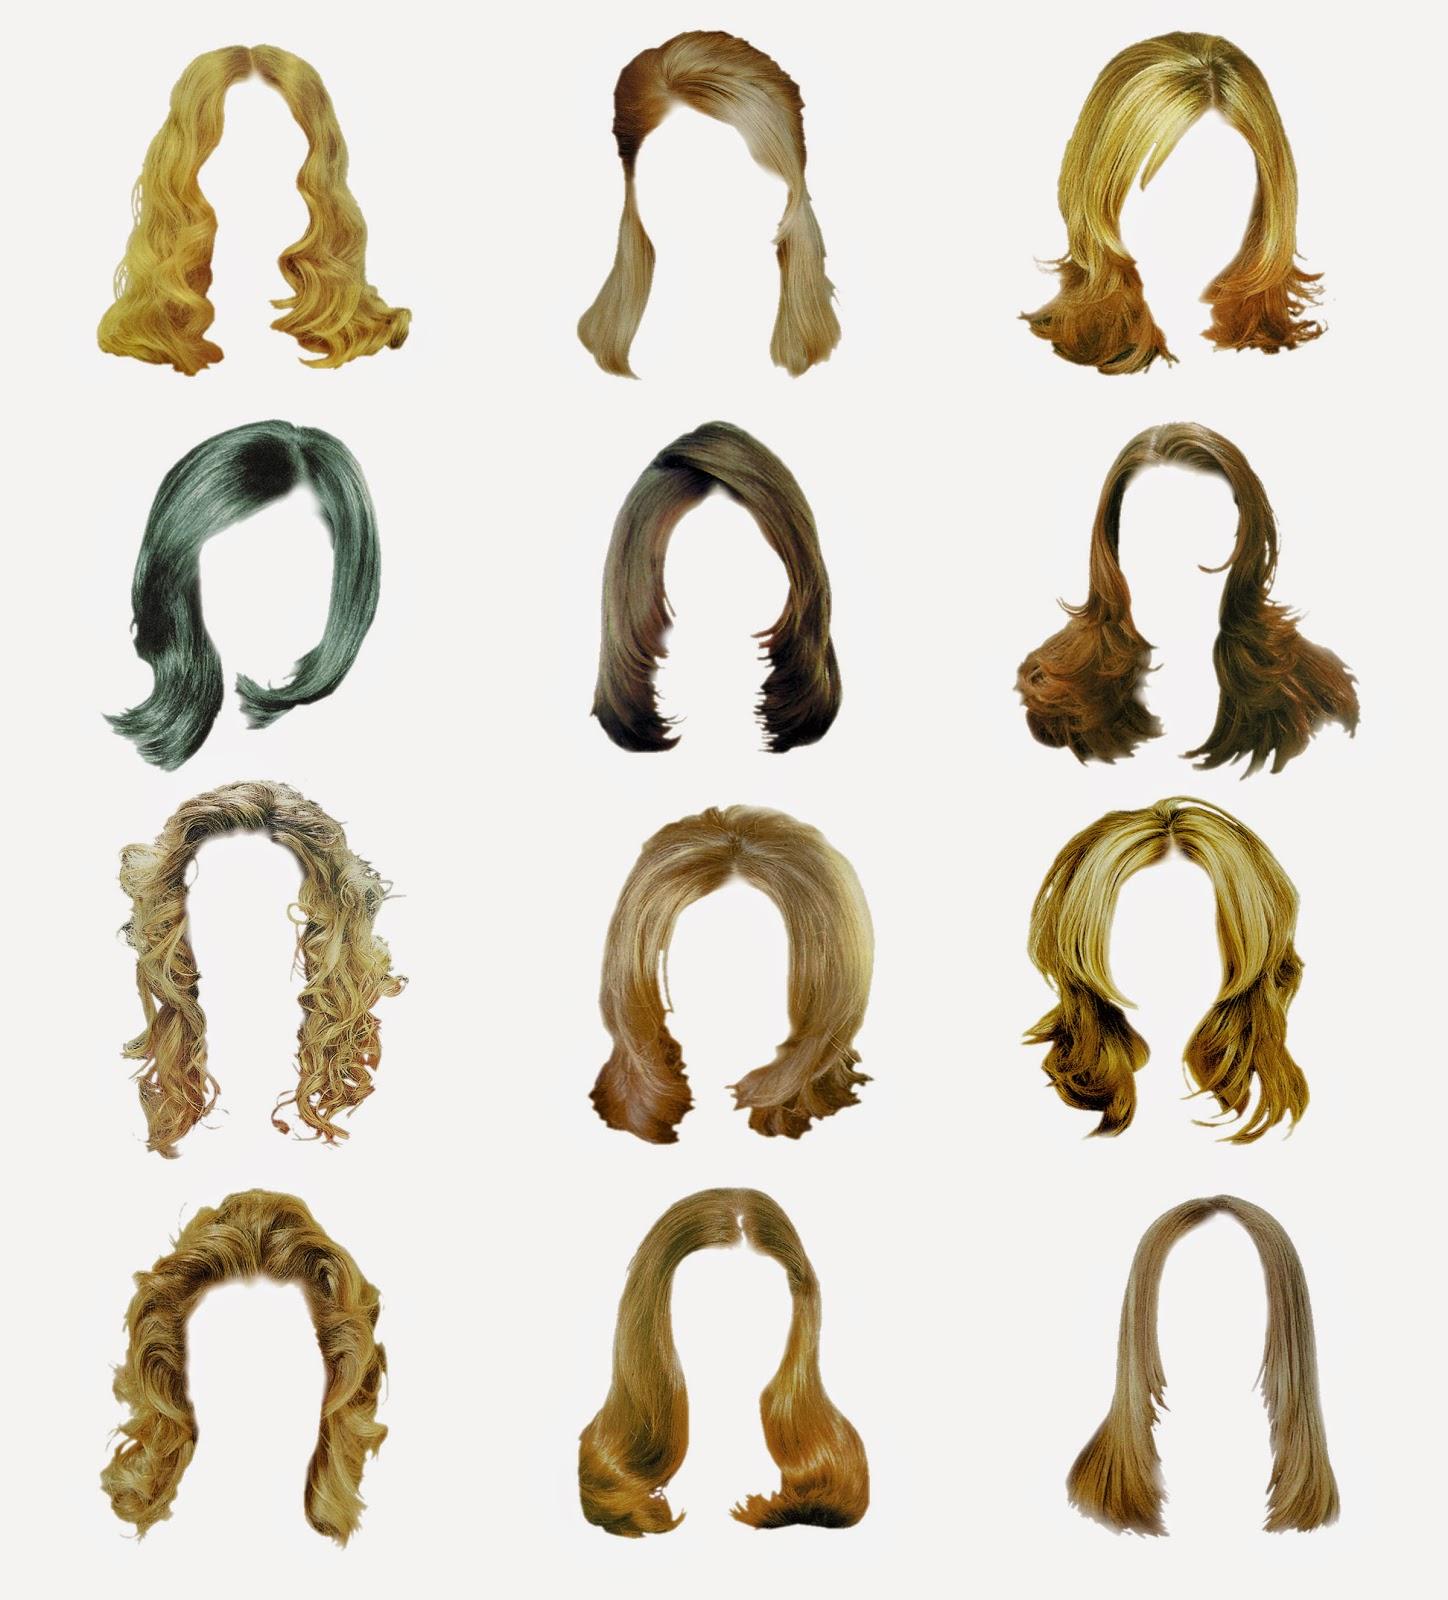 Hair PSD Free Download